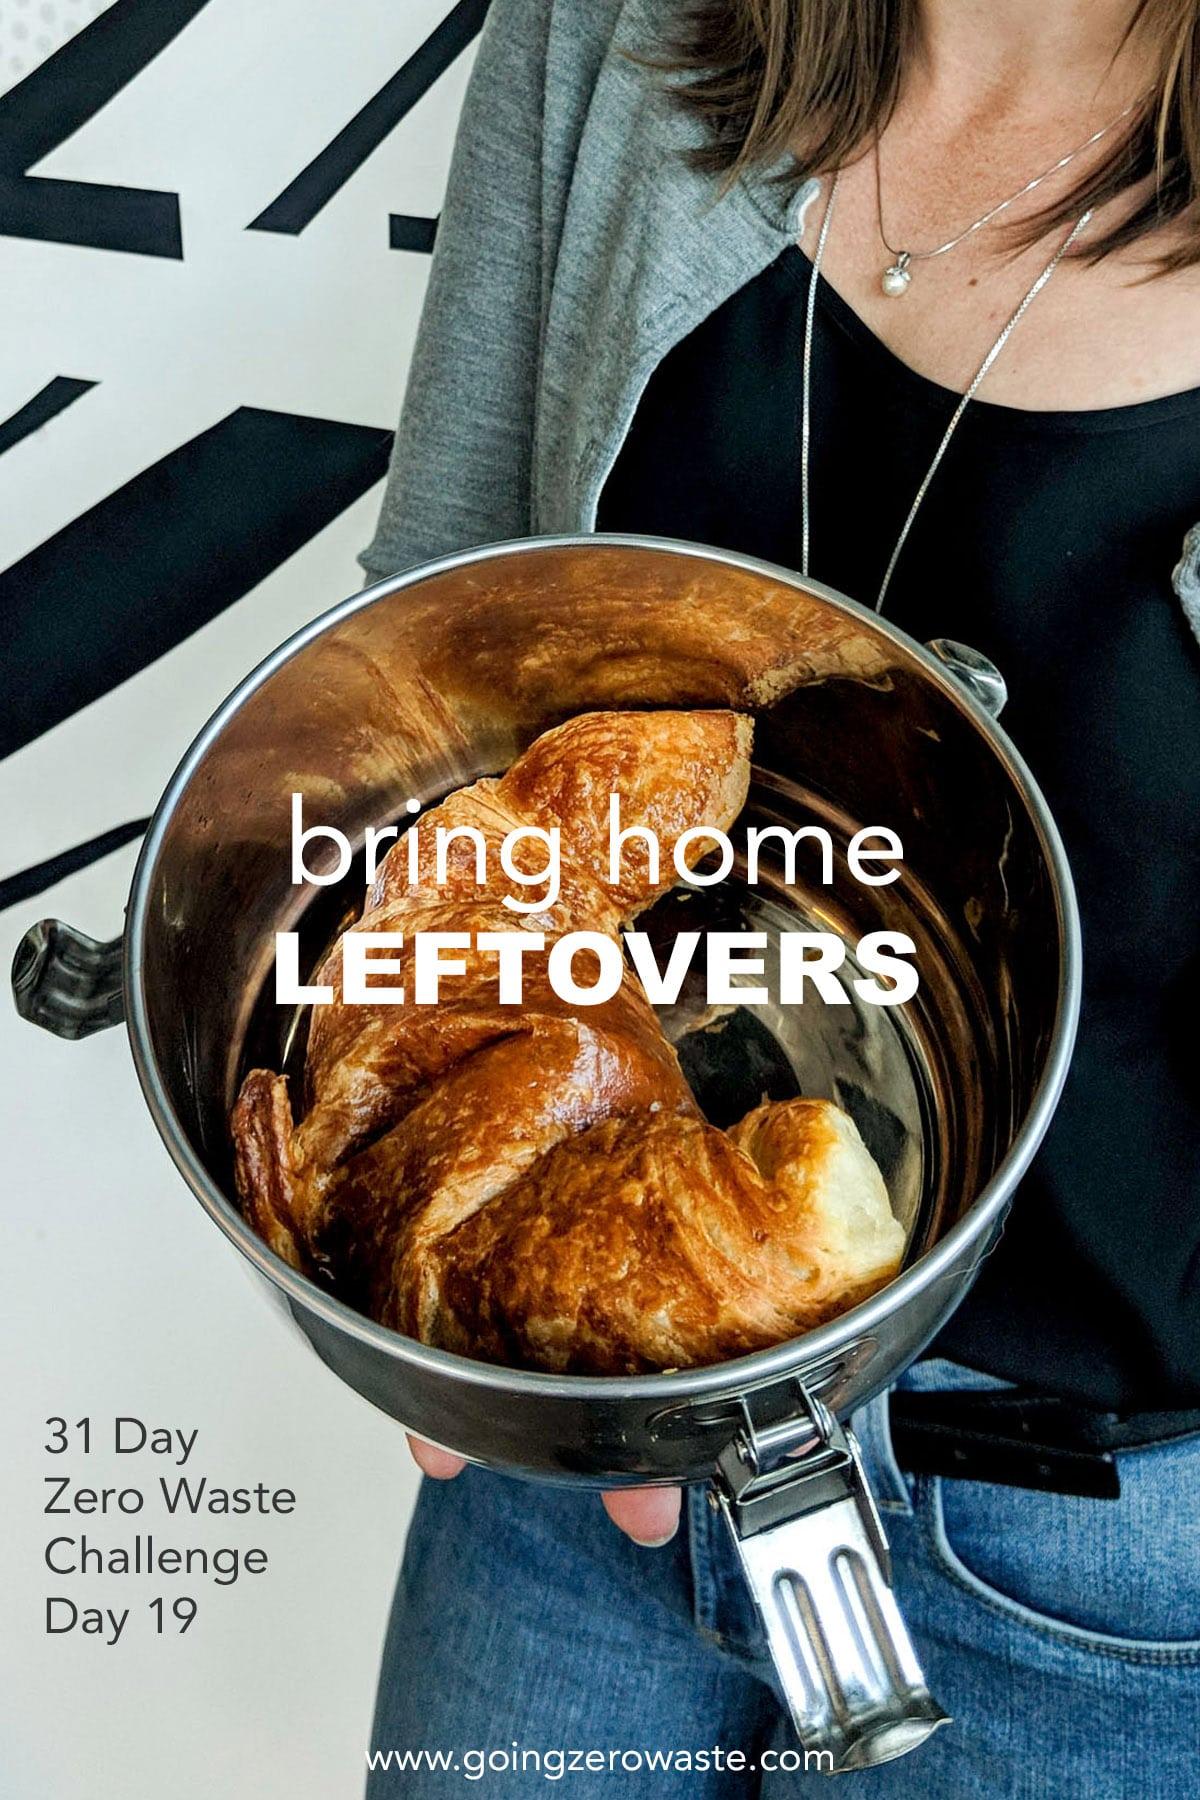 Bring Home Leftovers - Day 19 of the Zero Waste Challenge from www.goingzerowaste.com #zerowaste #ecofriendly #gogreen #sustainable #zerowastechallenge #challenge #sustainablelivingchallenge #leftovers